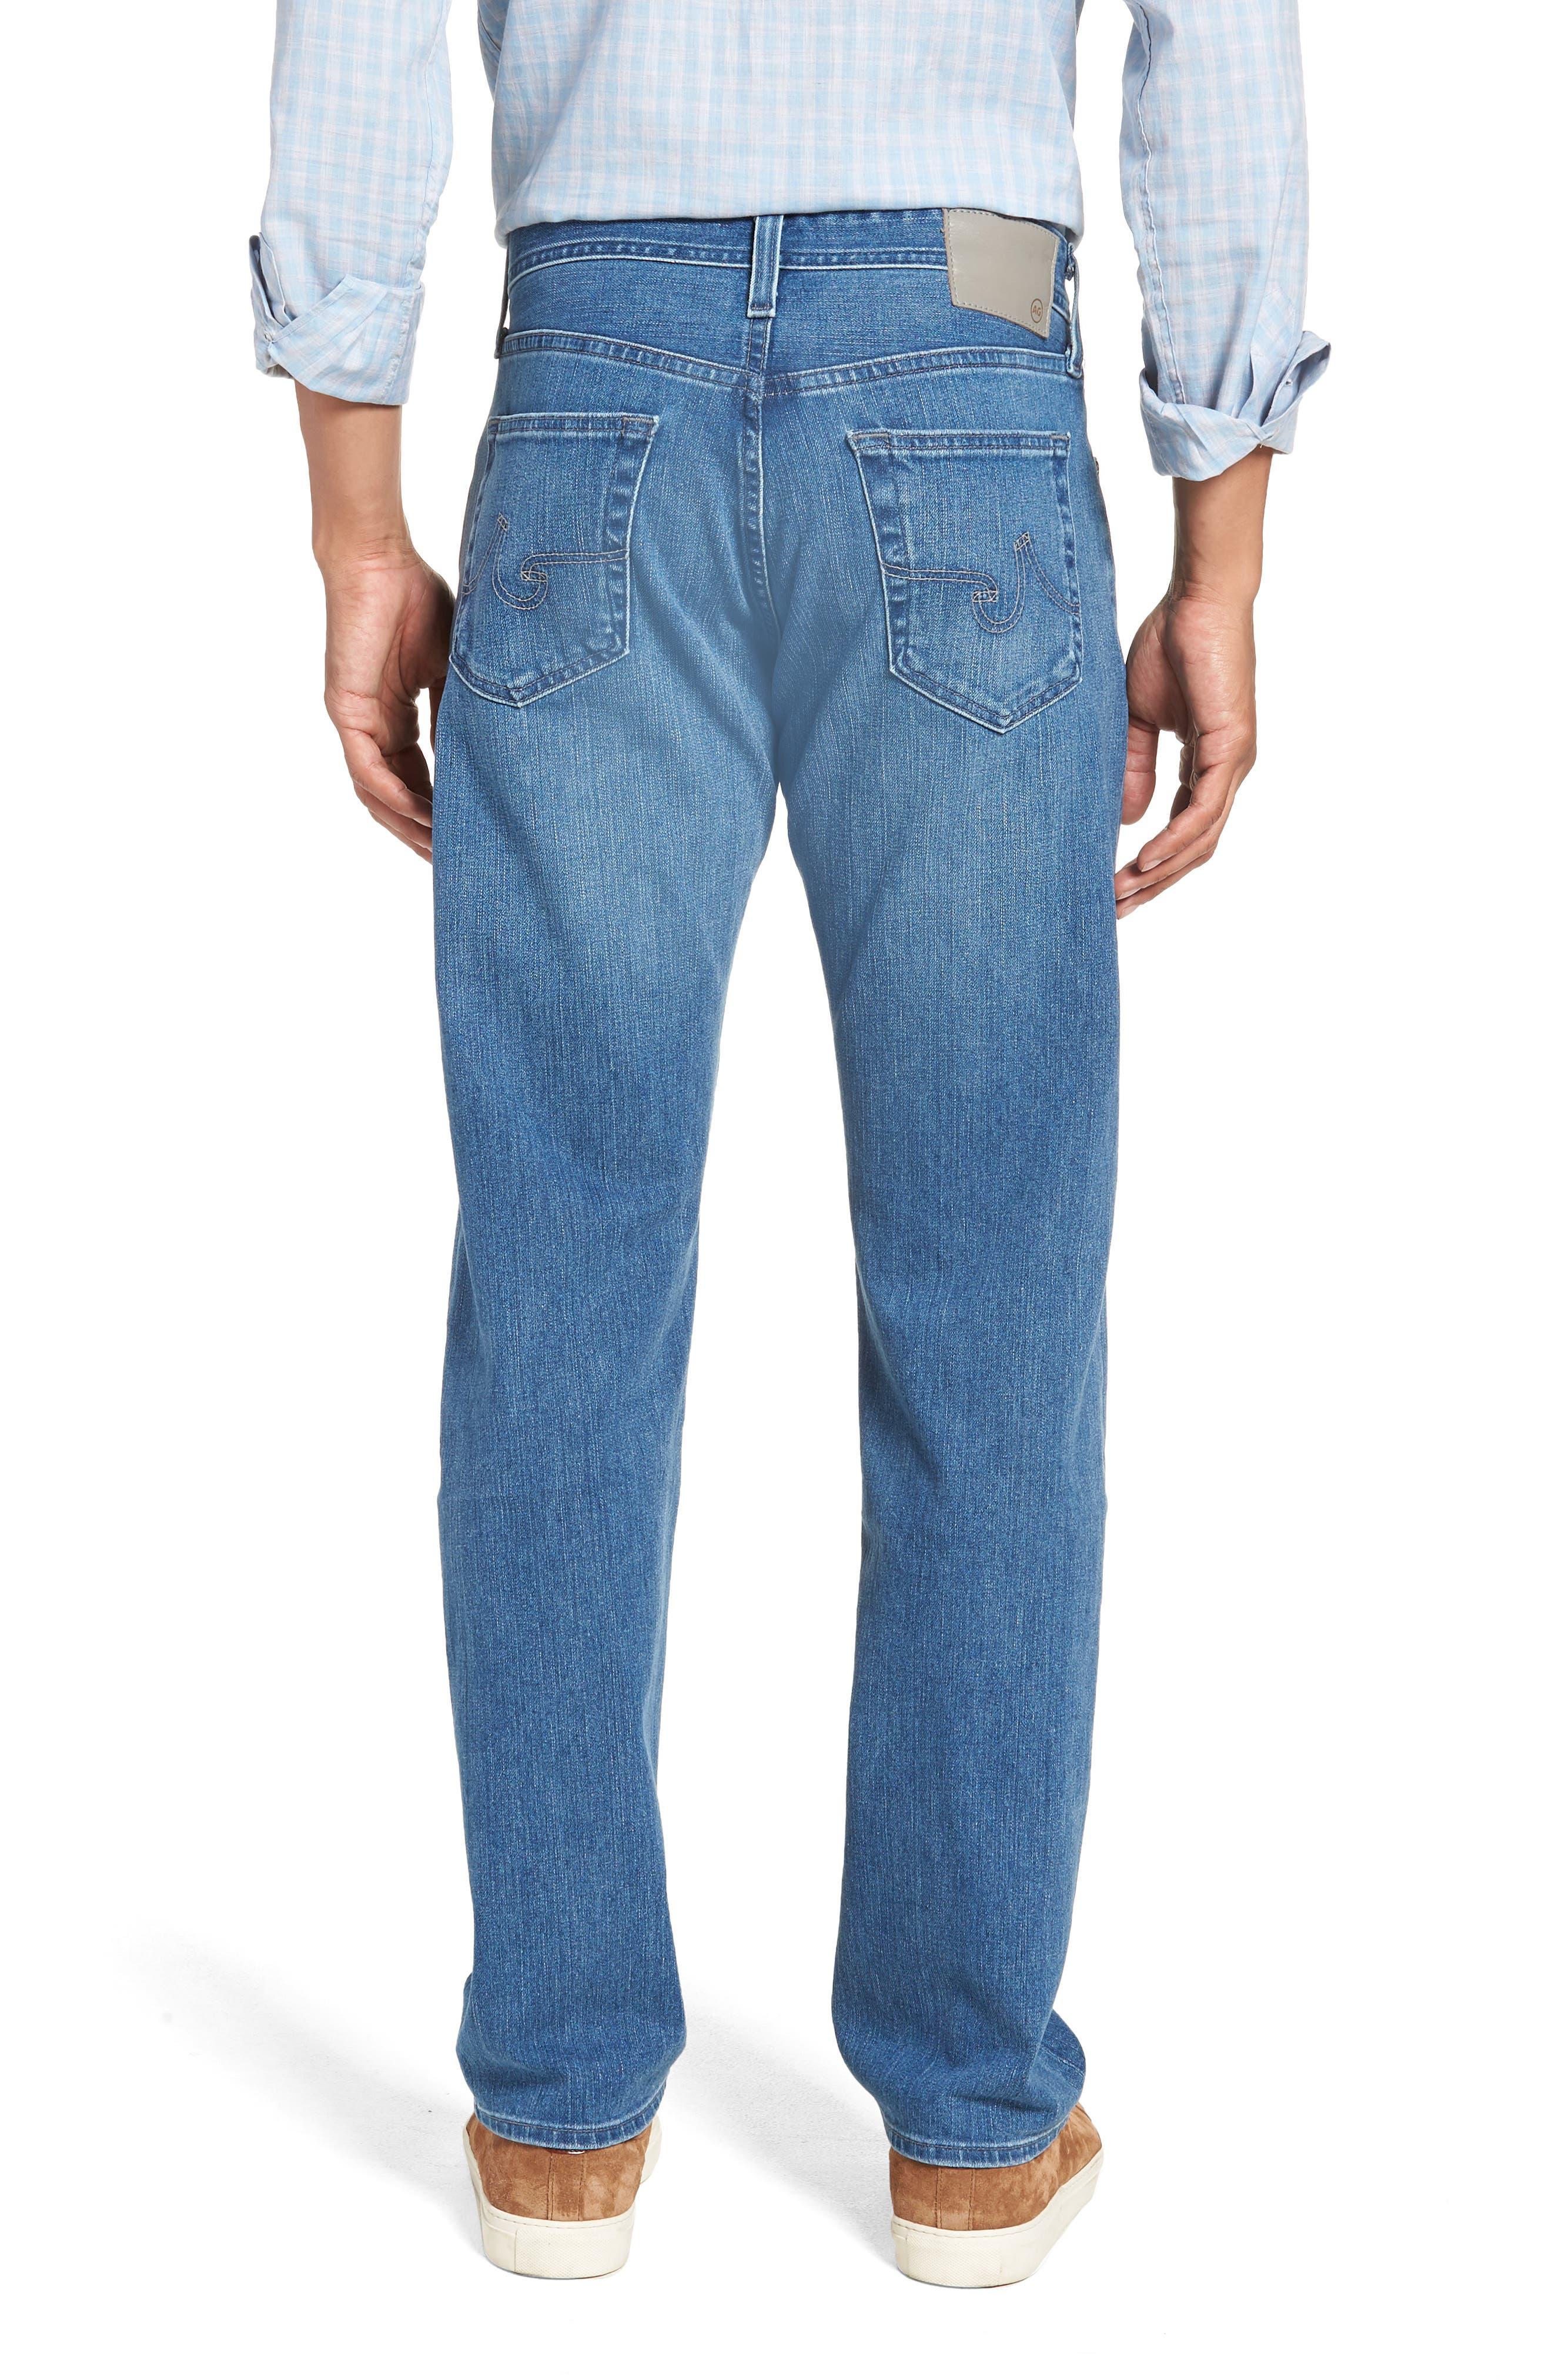 Graduate Slim Straight Leg Jeans,                             Alternate thumbnail 2, color,                             DEMOLITION